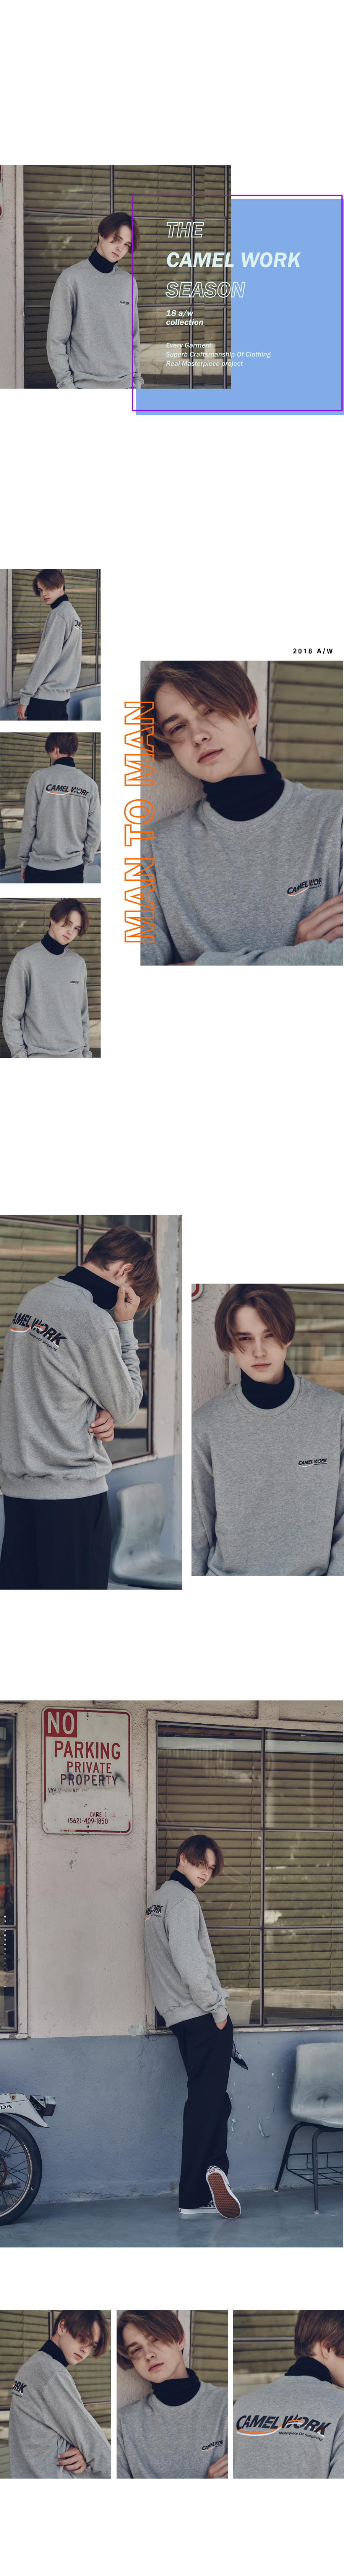 Wave logo sweatshirts g1.jpg